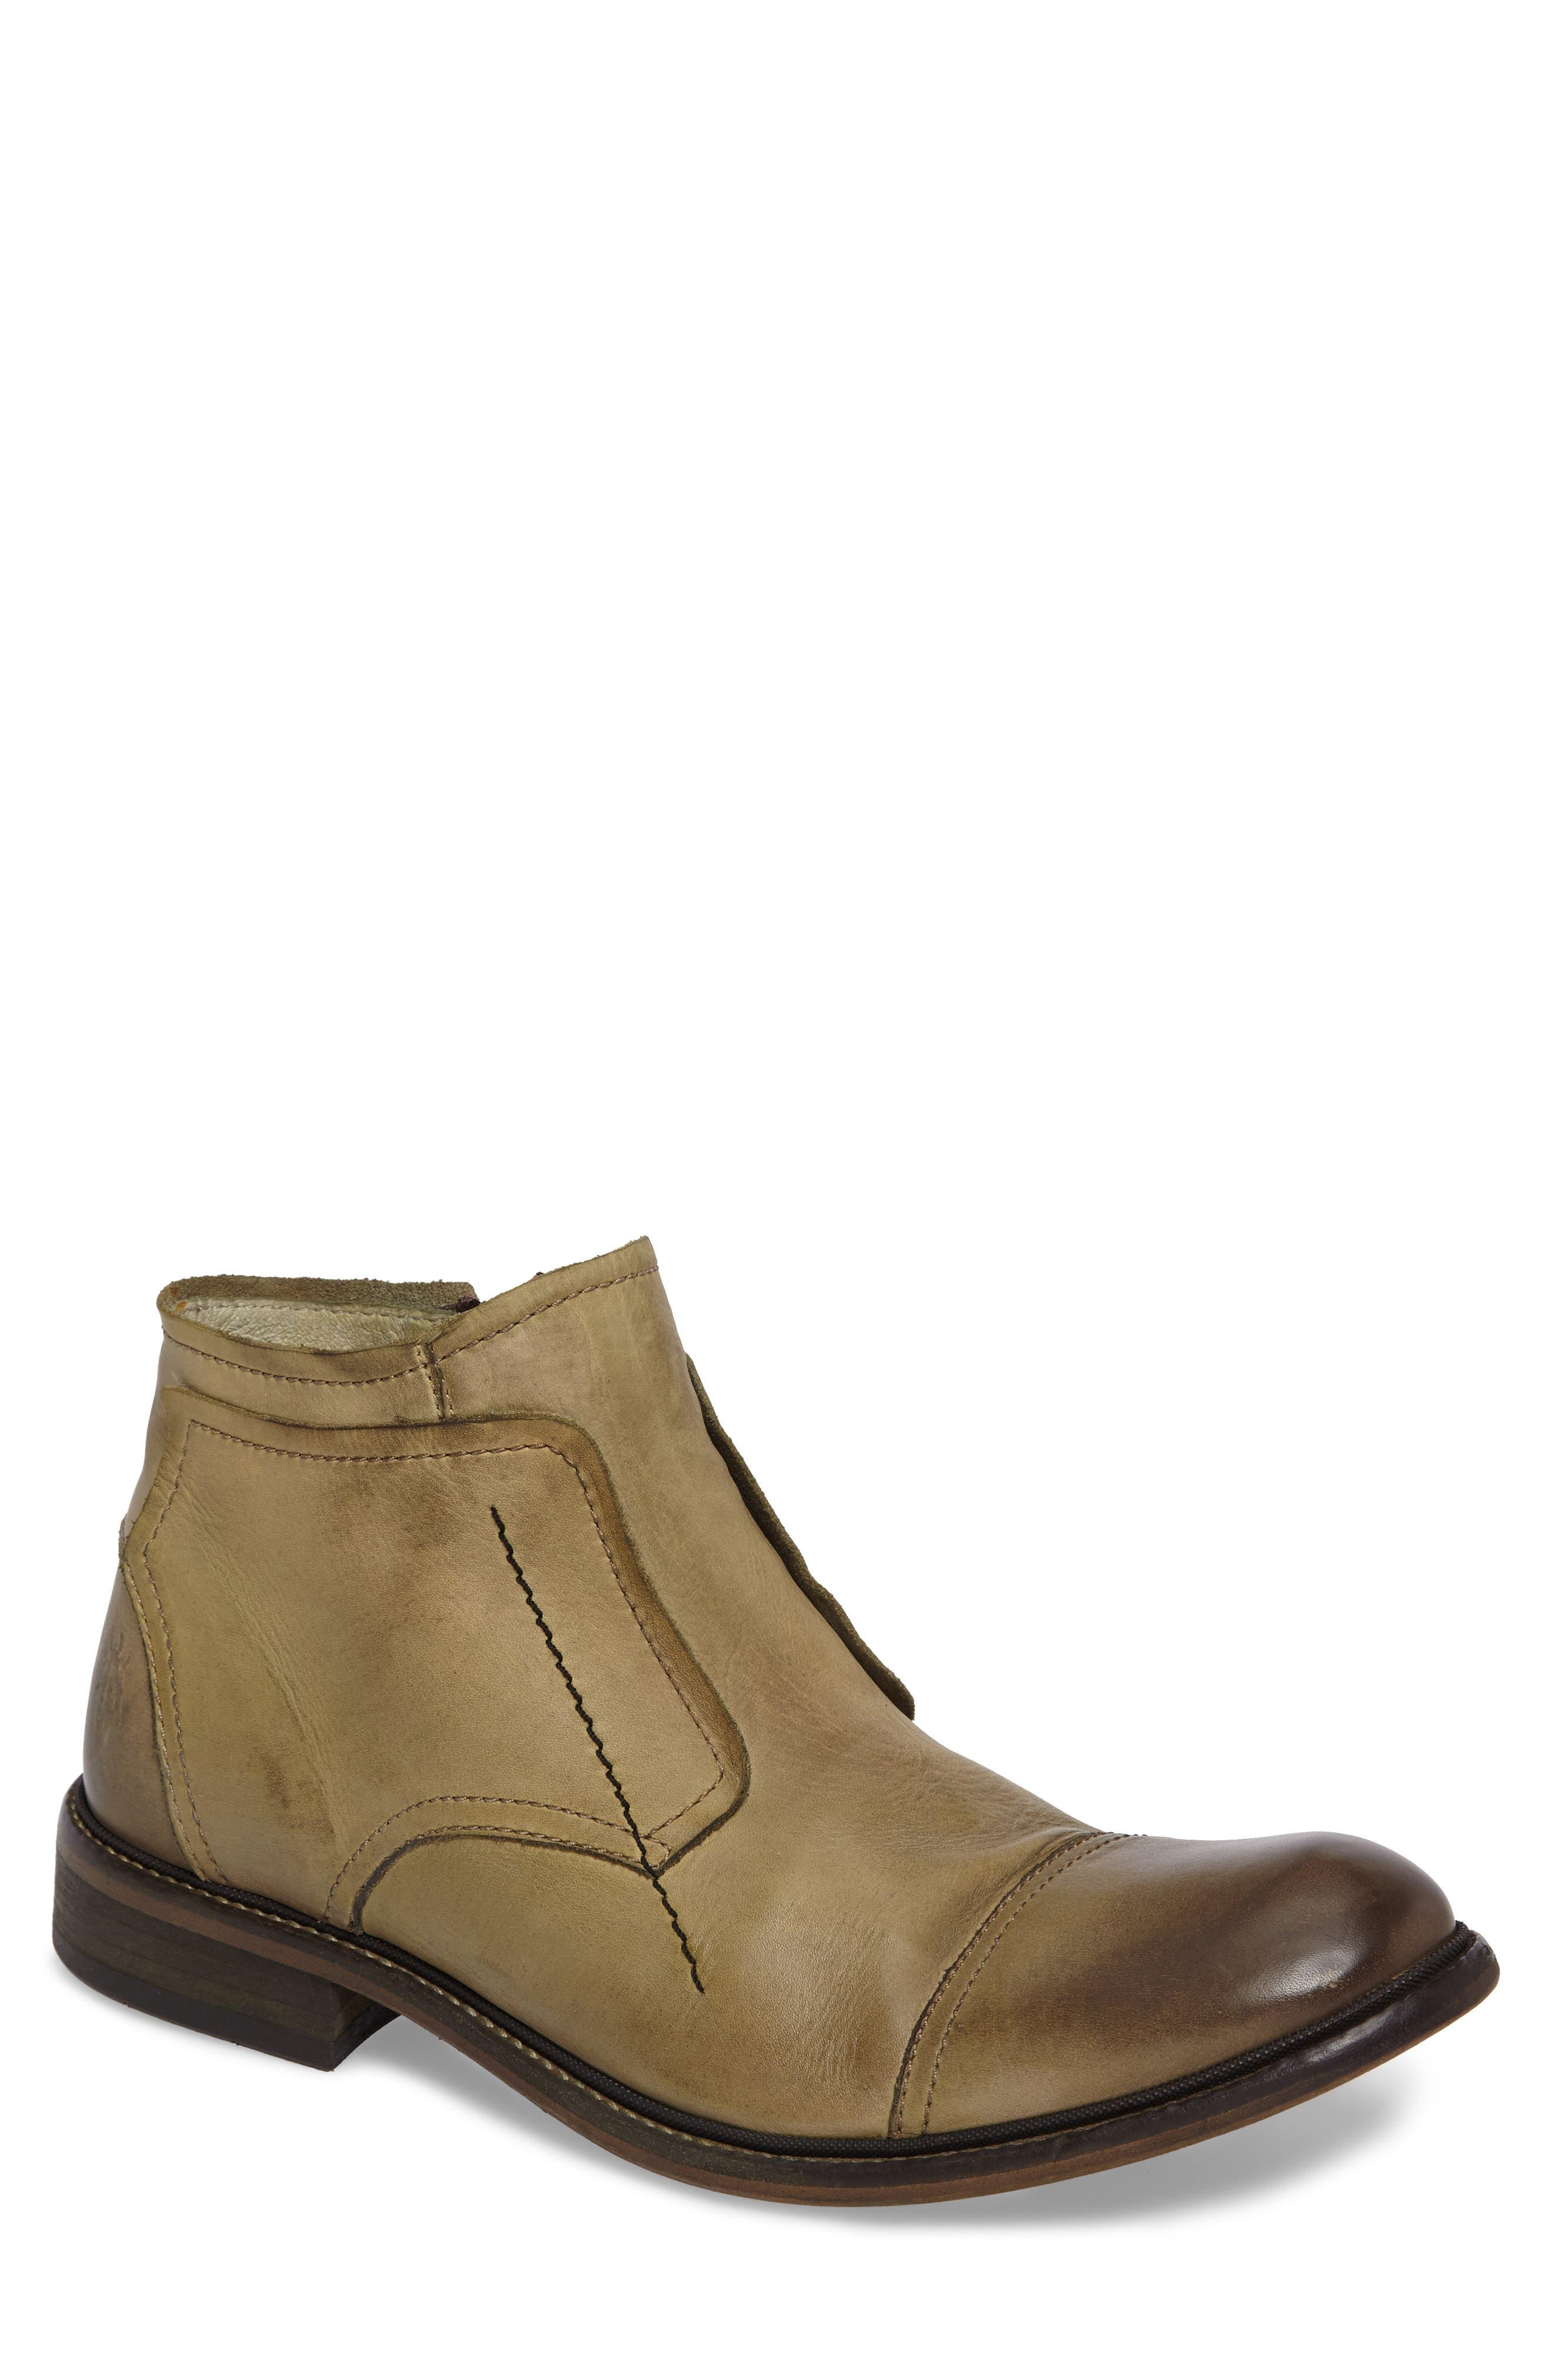 Hale Low Cap Toe Boot,                         Main,                         color, Salvia